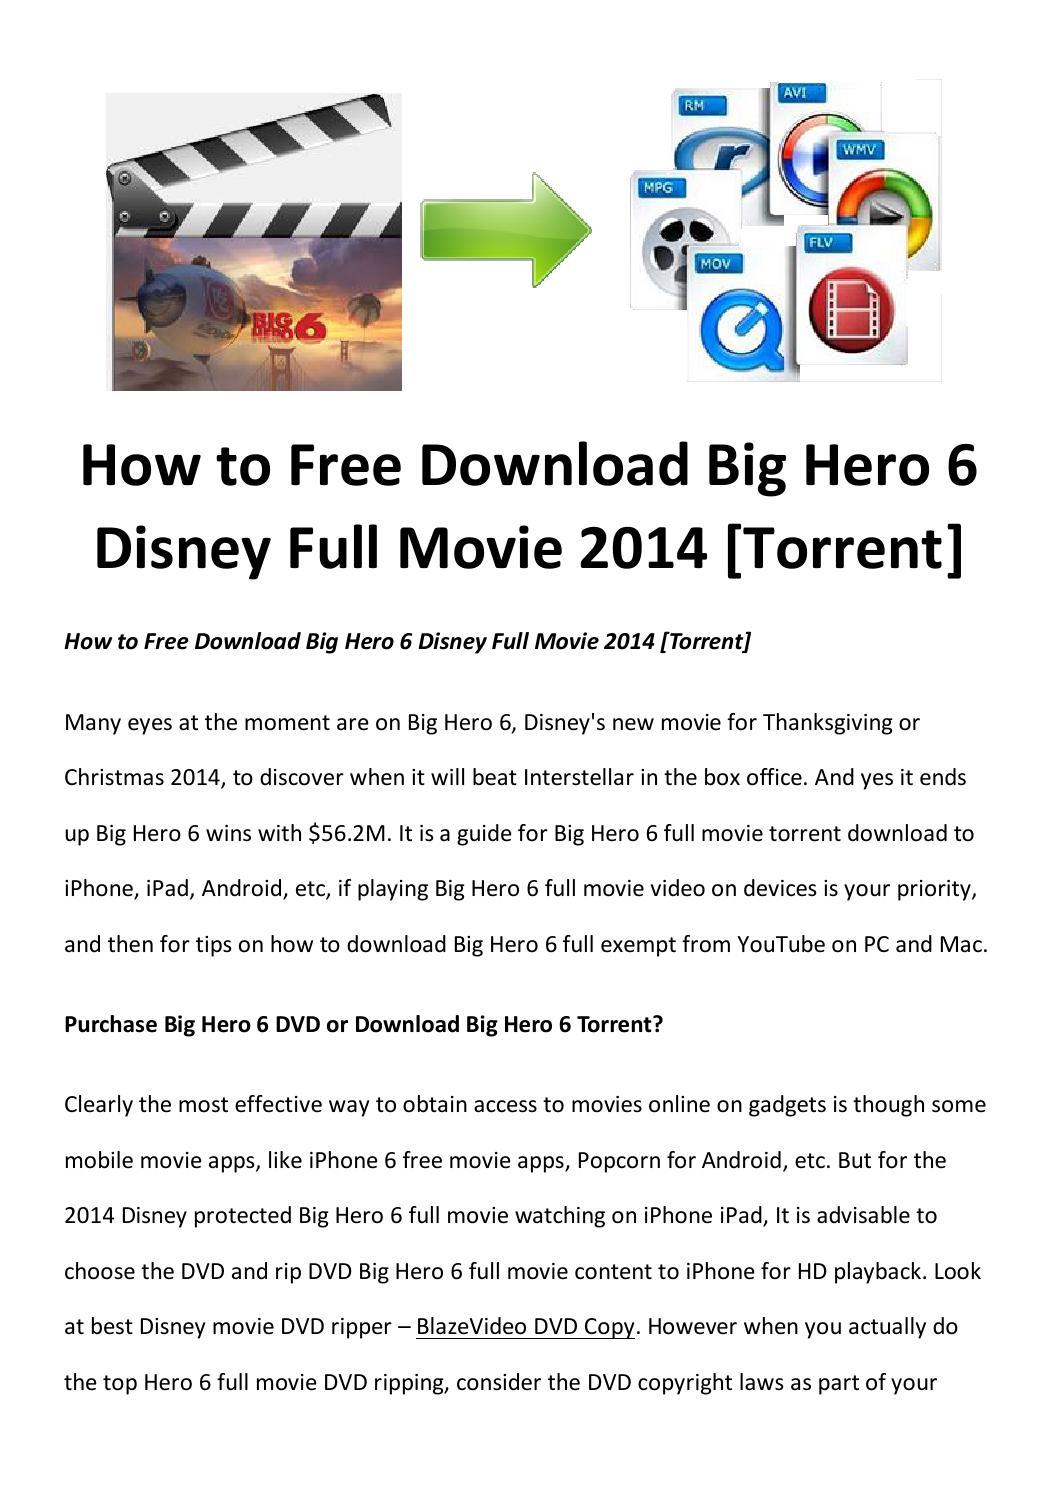 Download big hero 6 full free online by amigabit - issuu